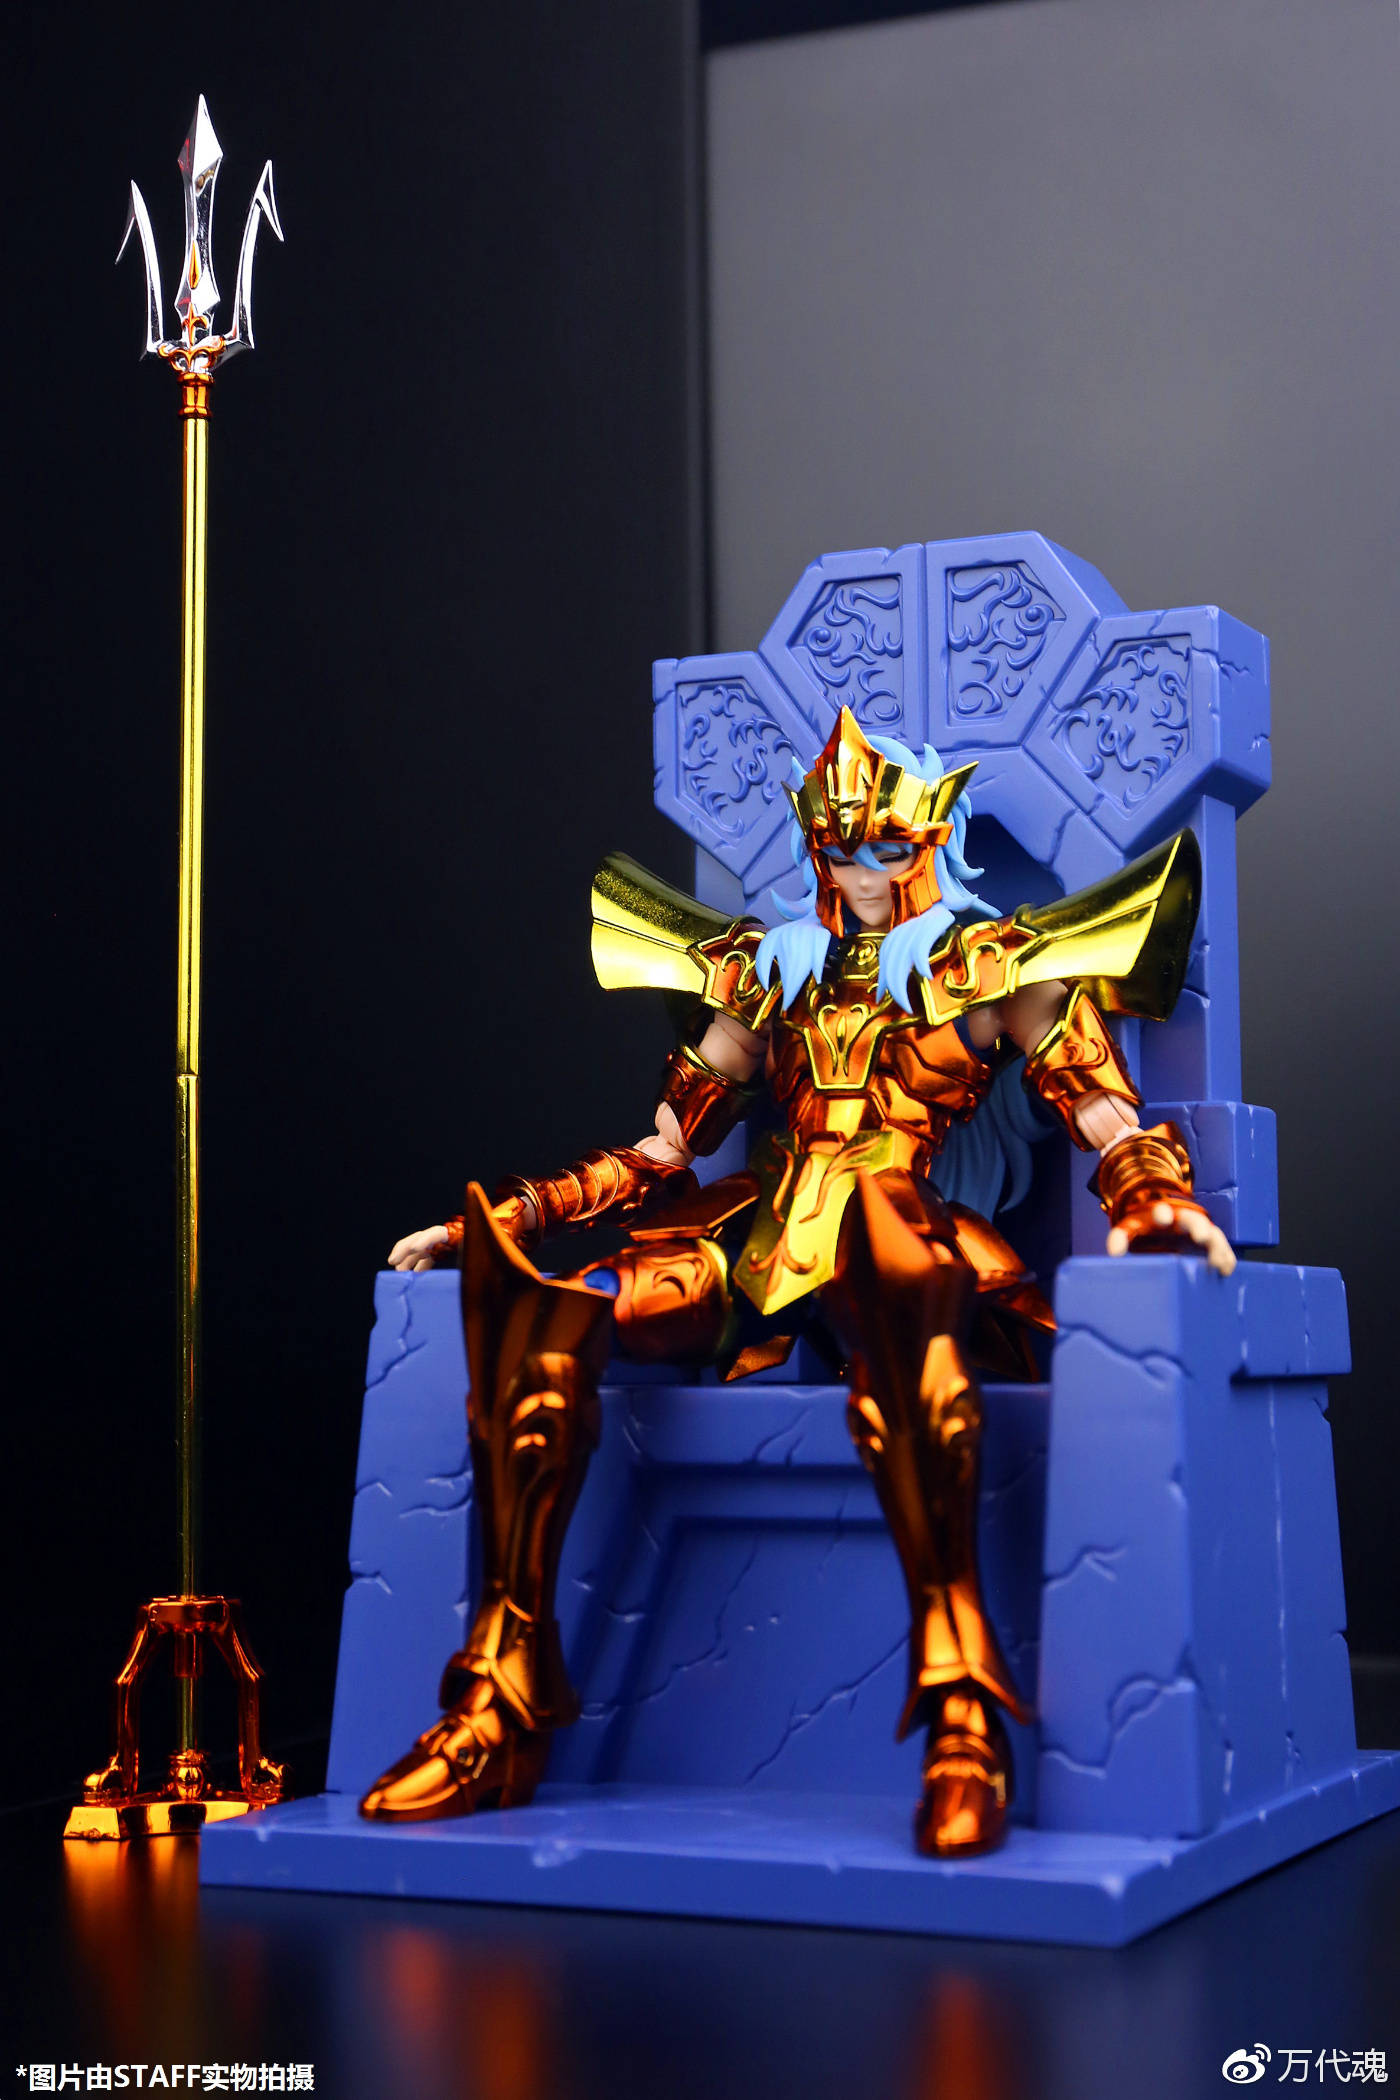 [Comentários] Saint Cloth Myth EX - Poseidon EX & Poseidon EX Imperial Throne Set - Página 2 DaQ8navc_o